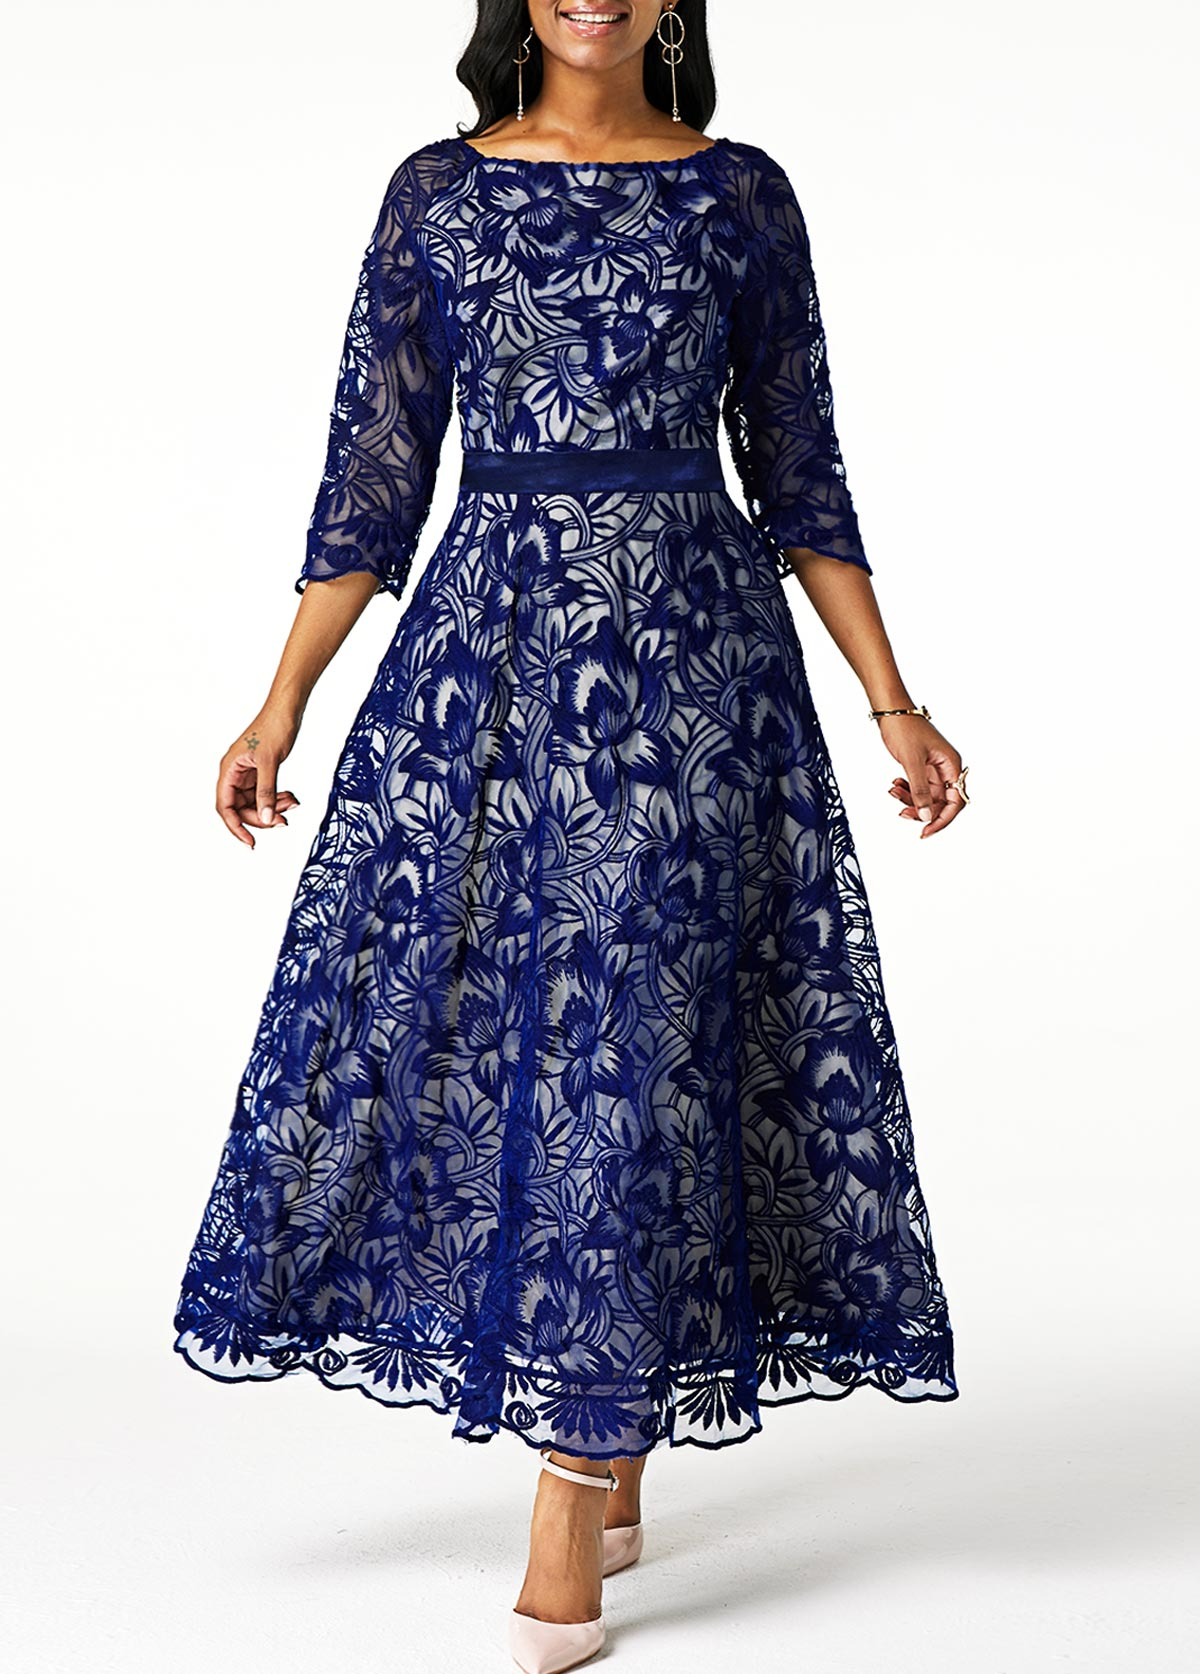 Back Zipper Three Quarter Sleeve Navy Blue Lace Dress